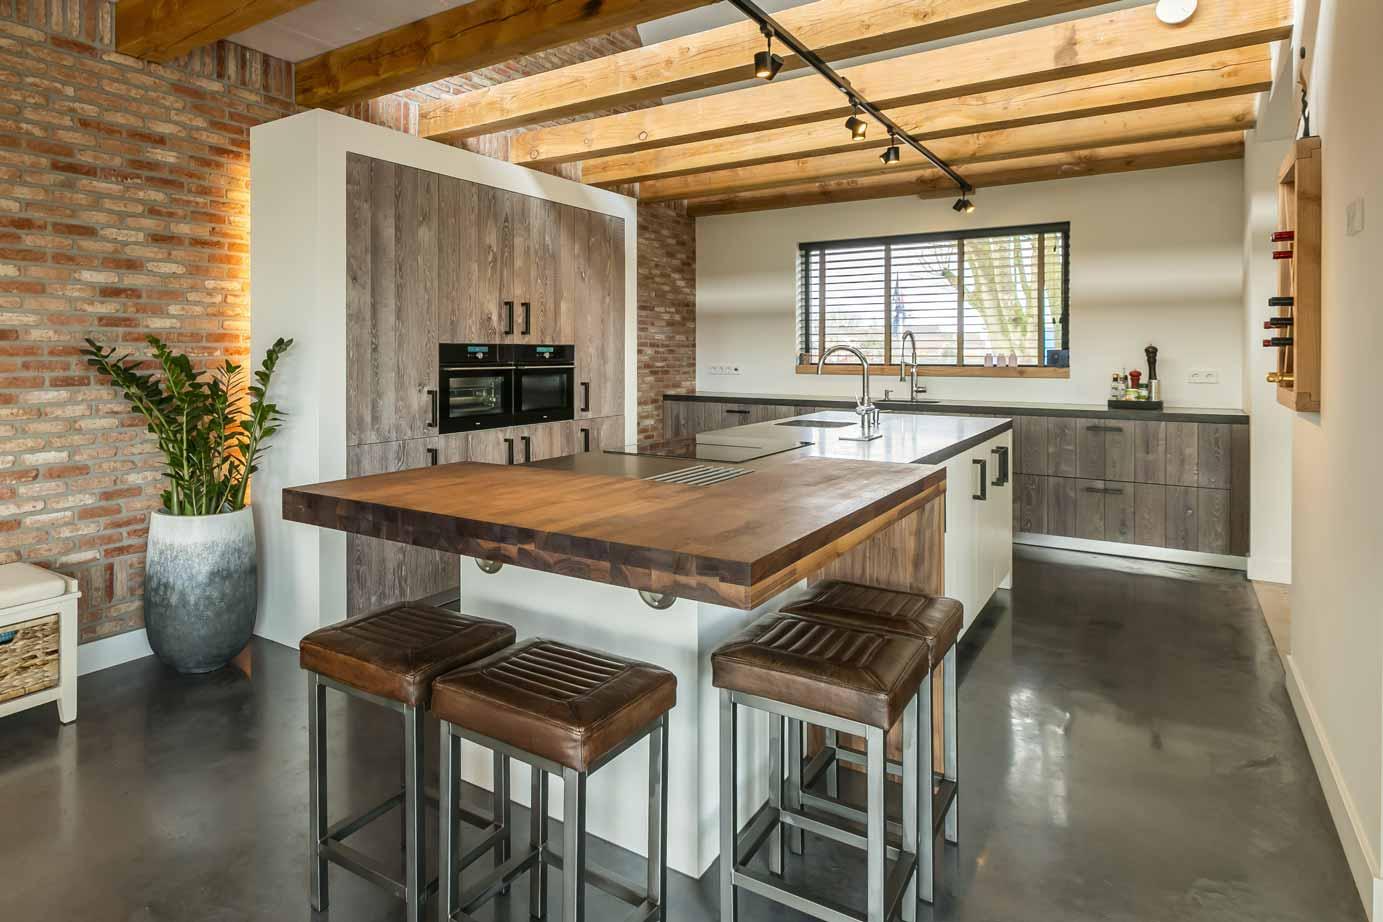 Kookeiland Keuken Houten : Moderne keukens keukens de abdij